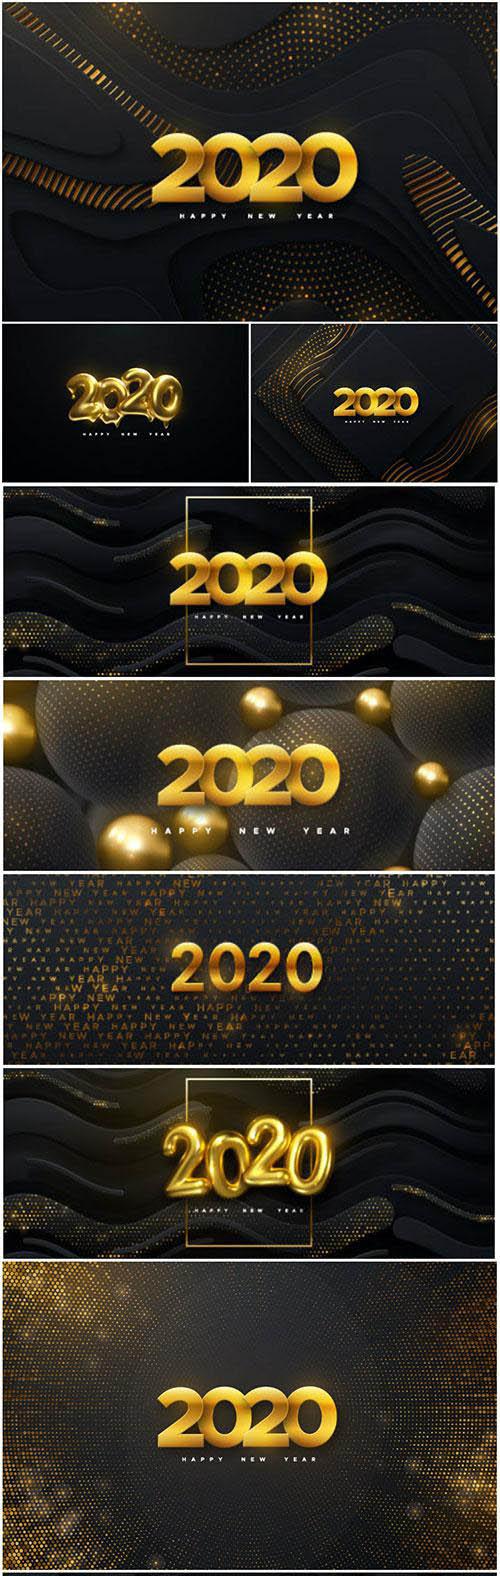 Happy New 2020 Year, vector holiday illustration